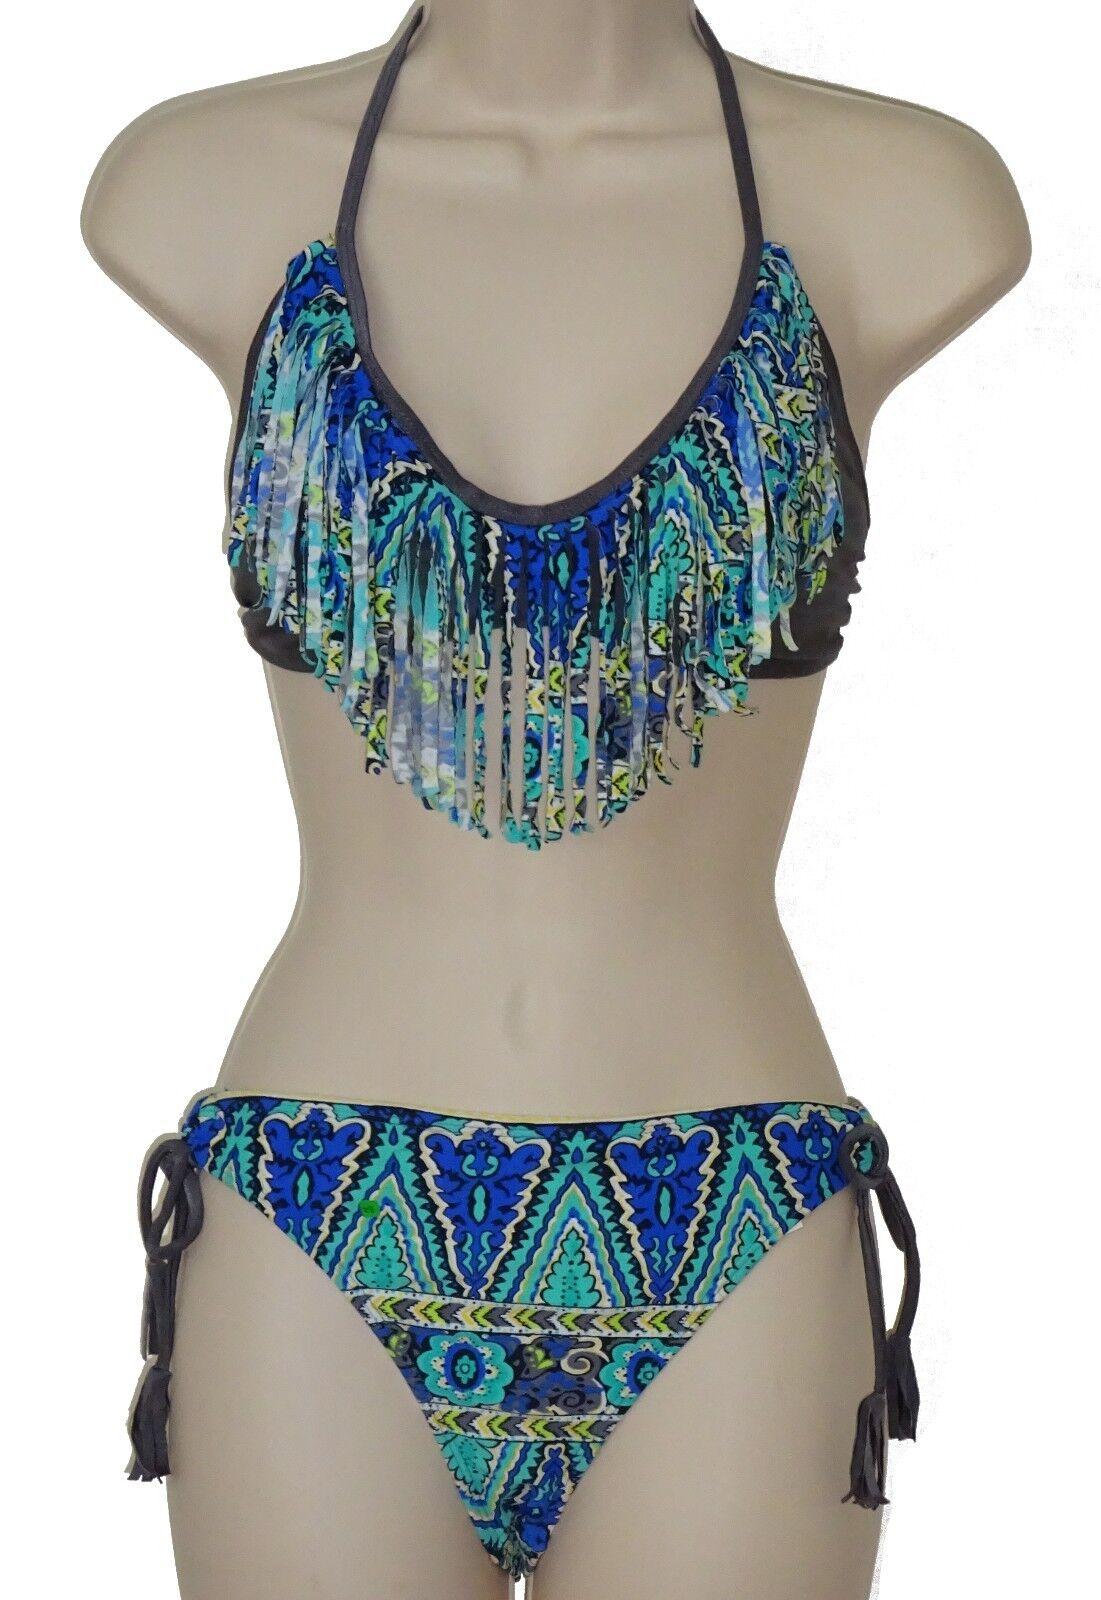 NWT Raisins Swimsuit Bikini 2pc set L Macrame Bra Tie Side Sweet Pea Pant